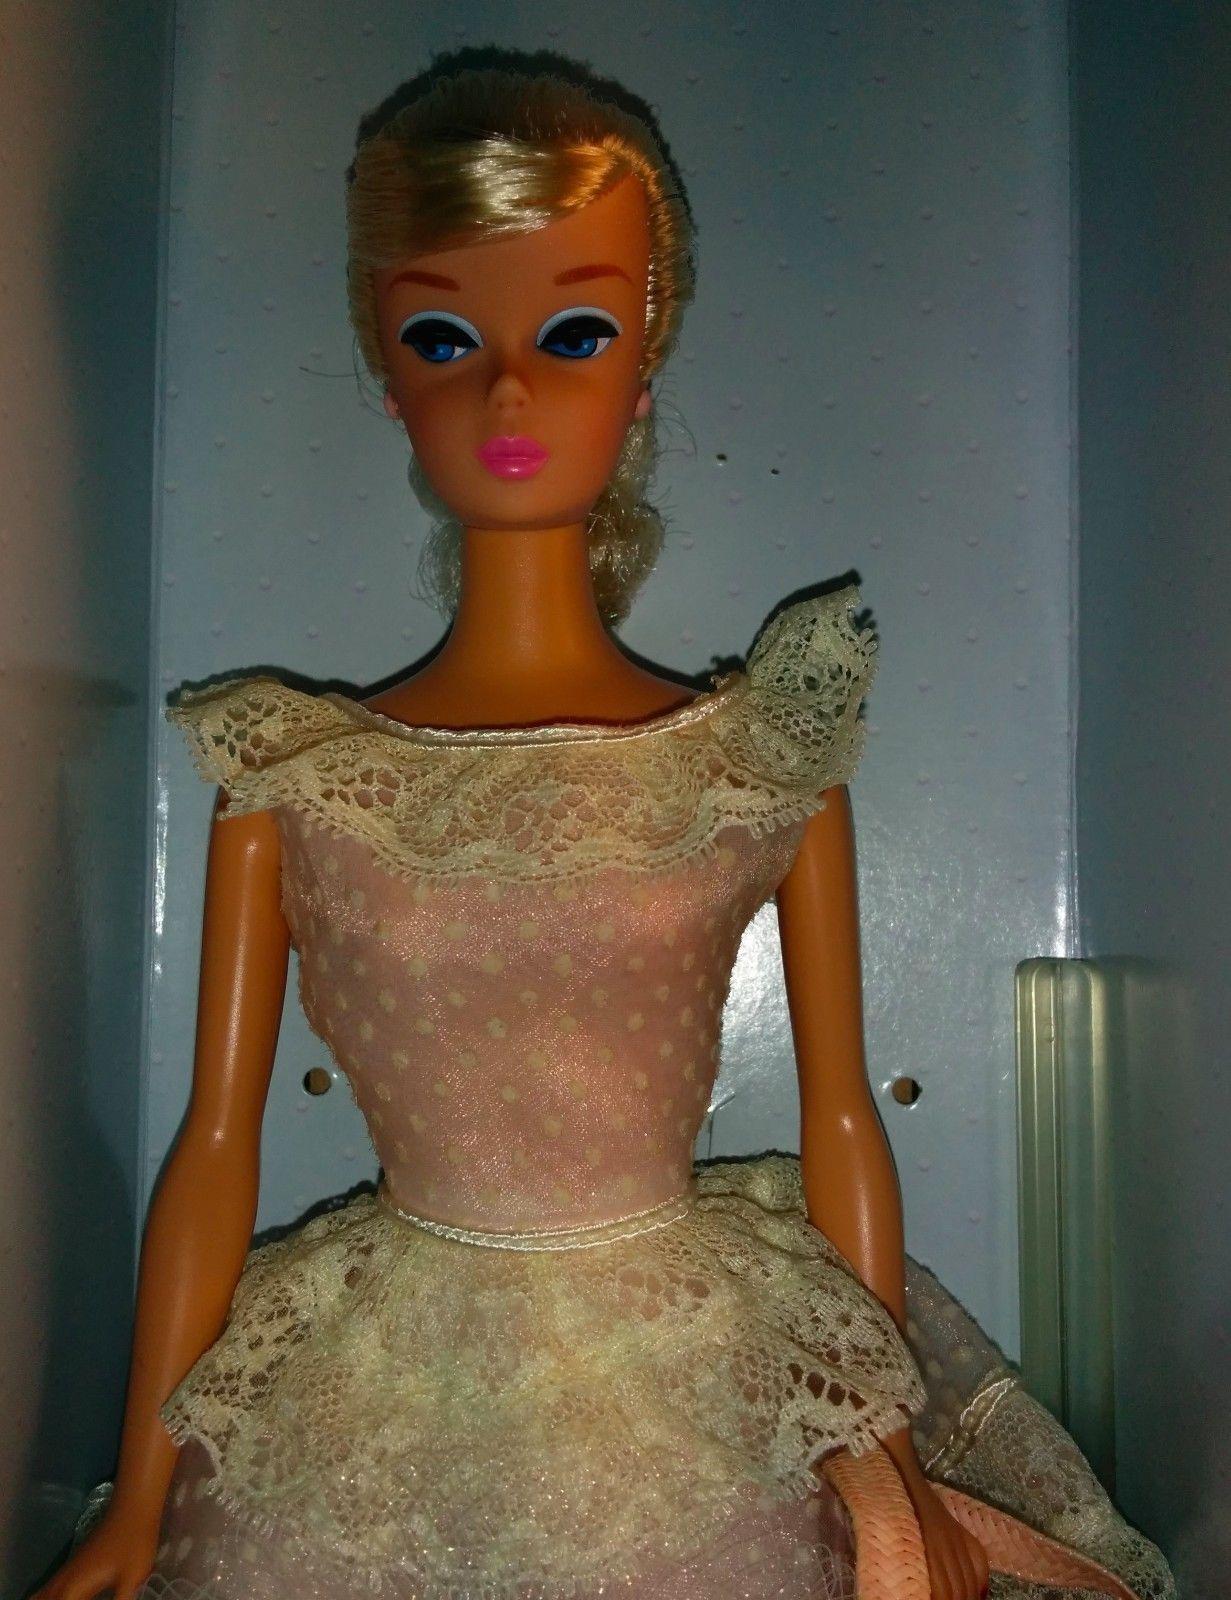 Barbie Mattel Plantation Belle Vintage Reproduction Doll 2003 Complete in Box | eBay